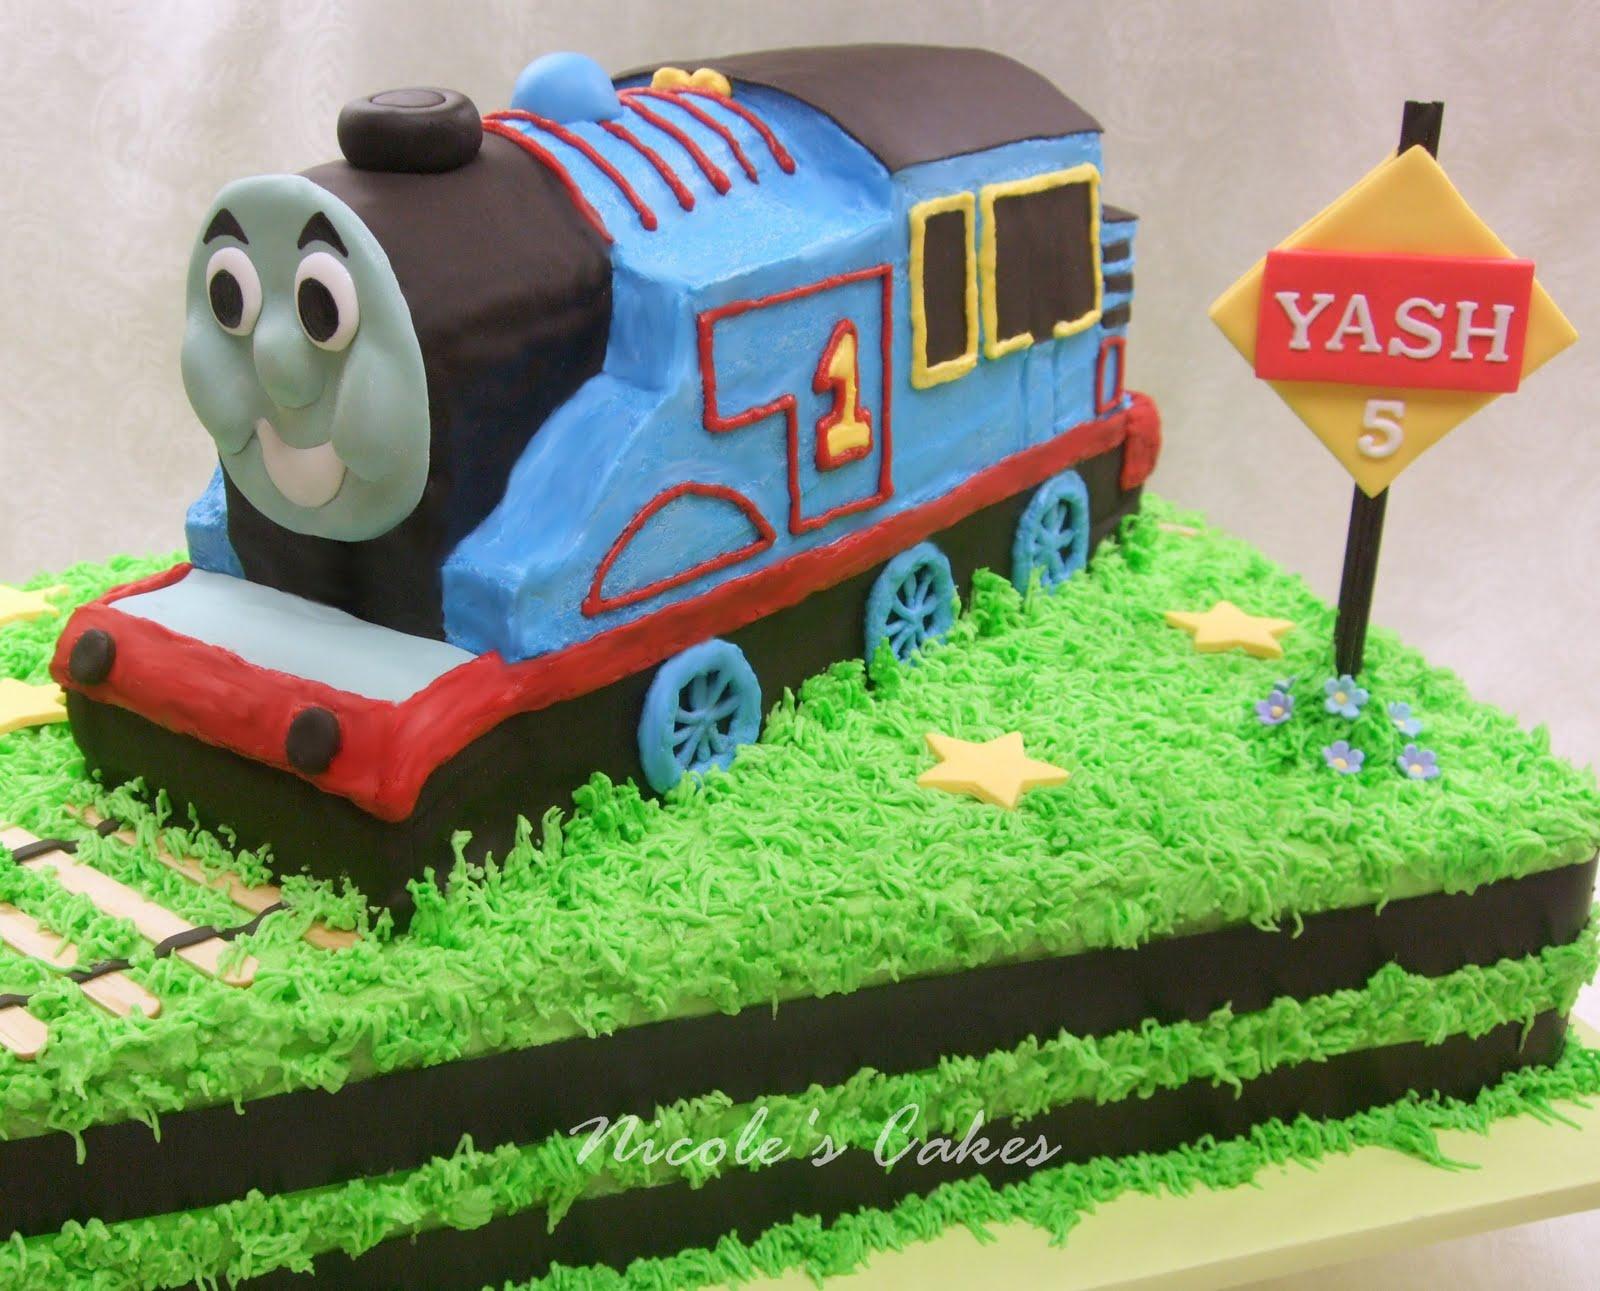 On Birthday Cakes 3 D Model Thomas The Tank Engine Cake Eggless